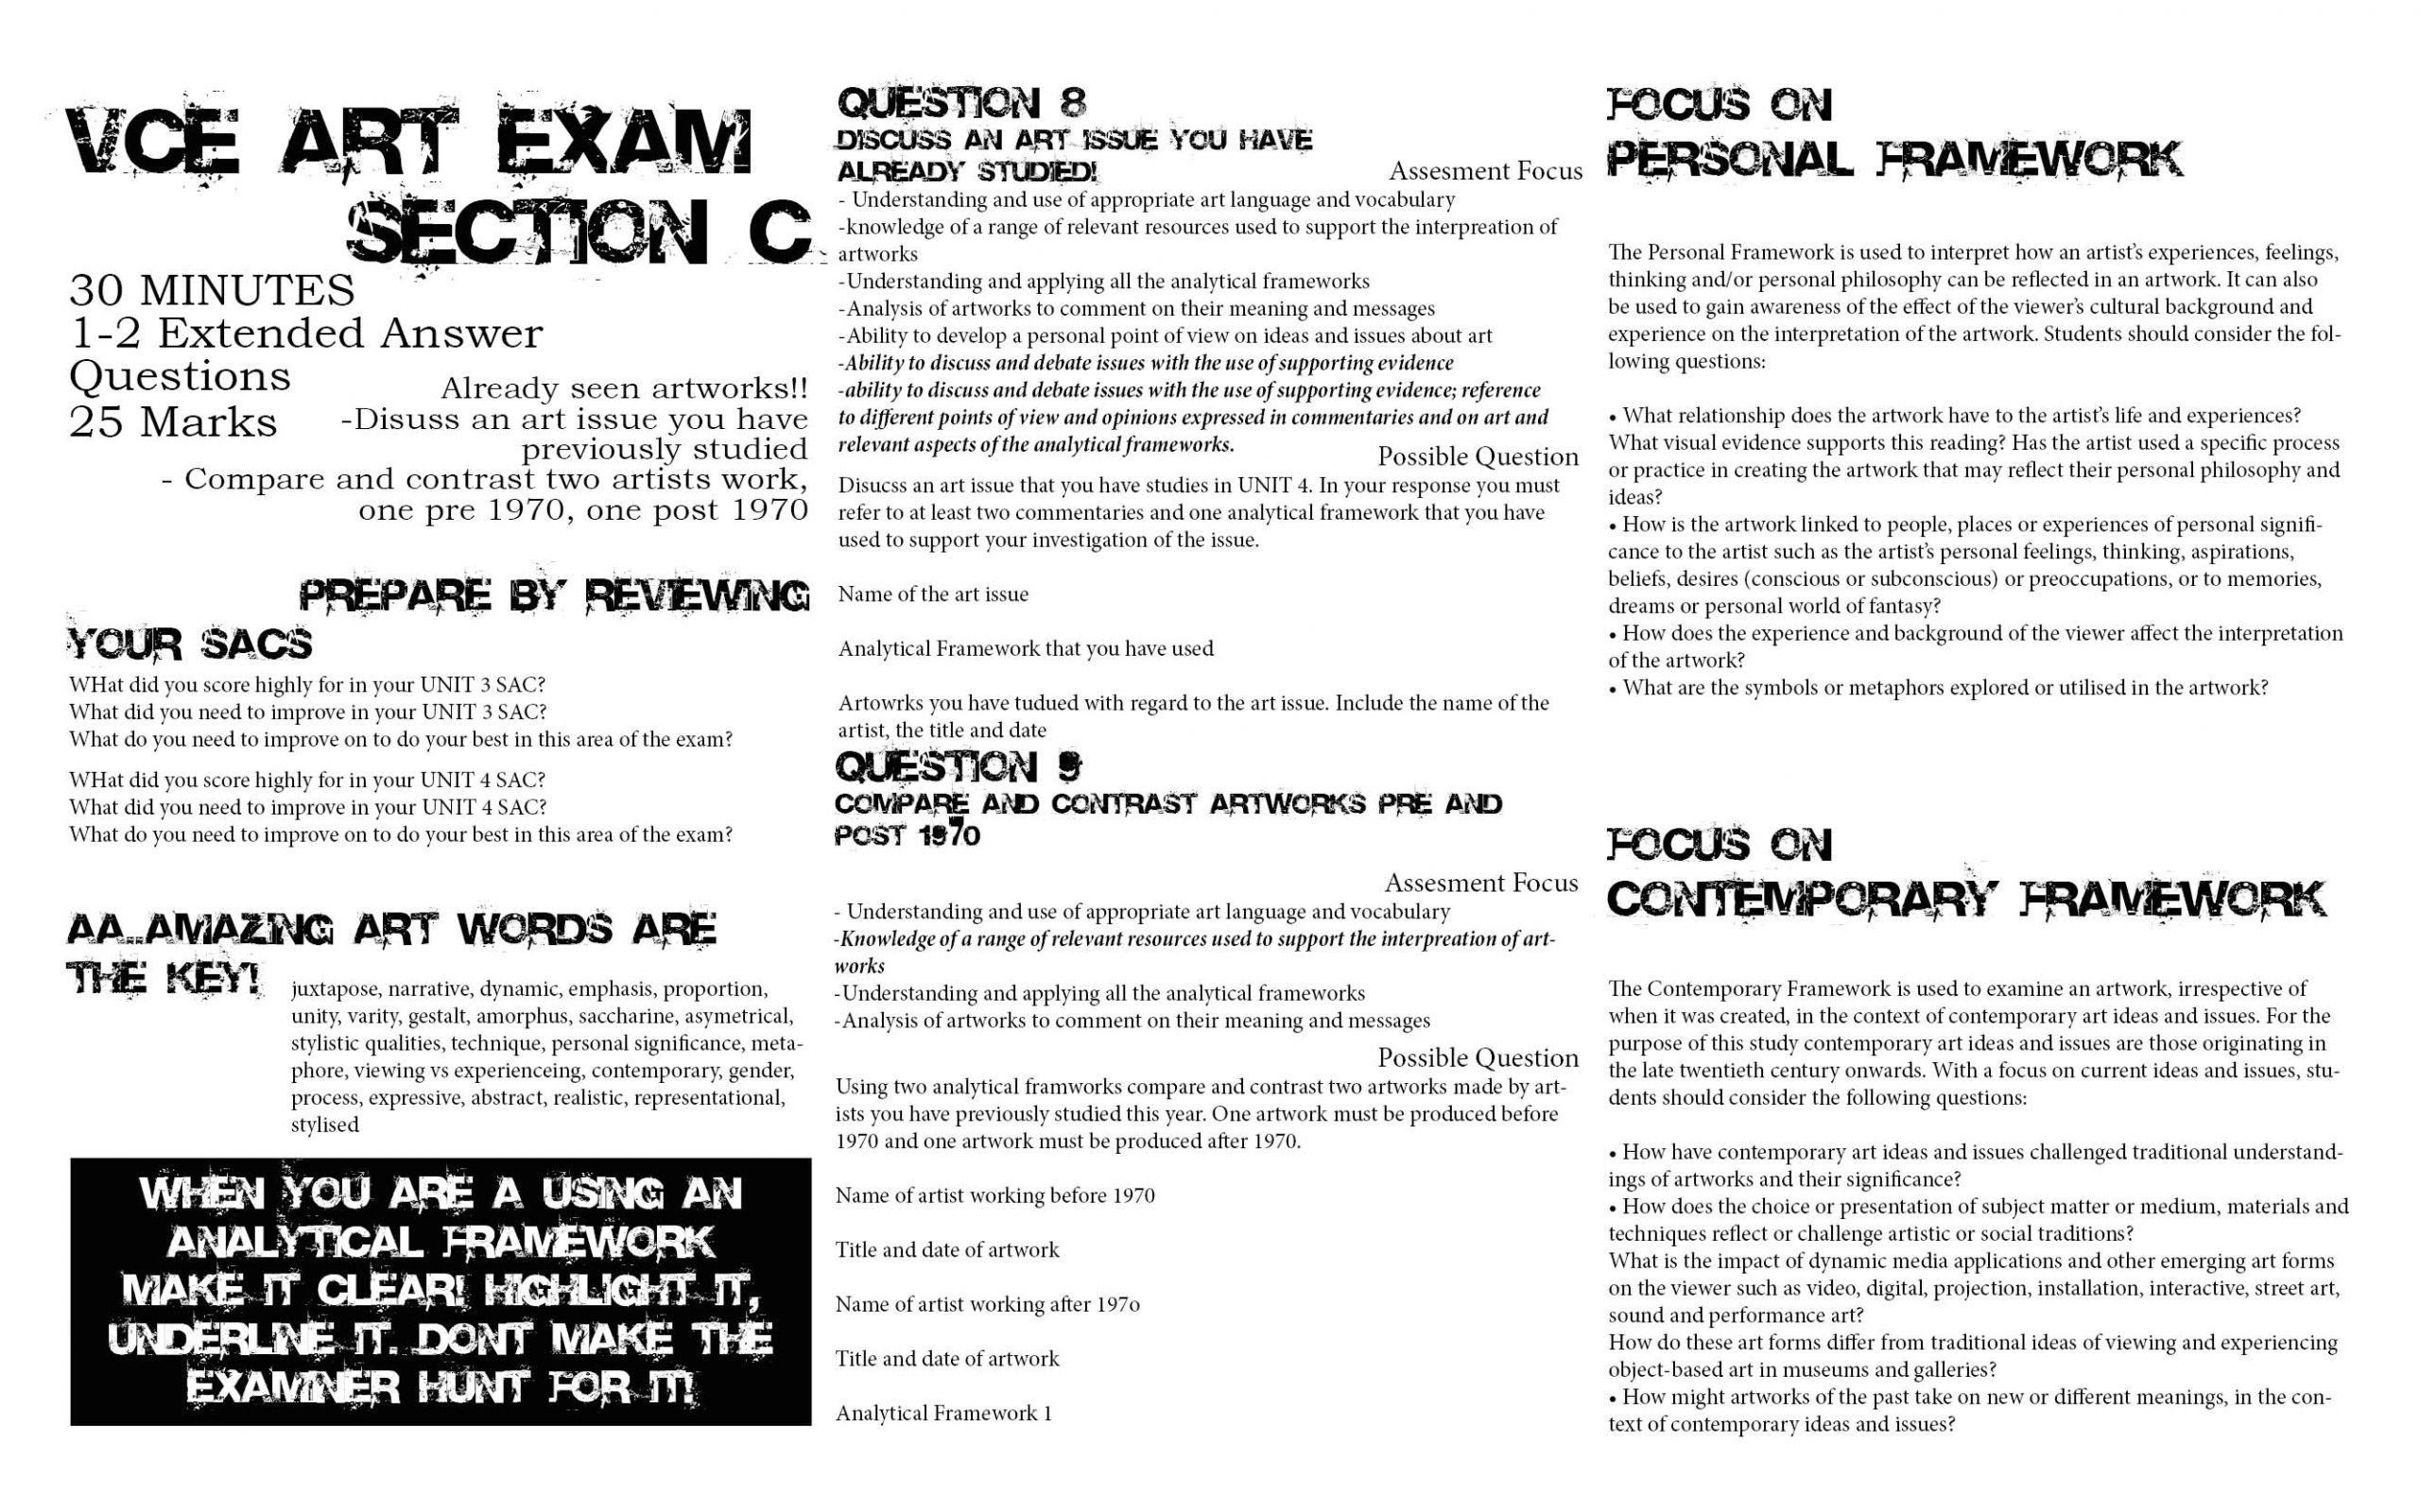 vce art exam